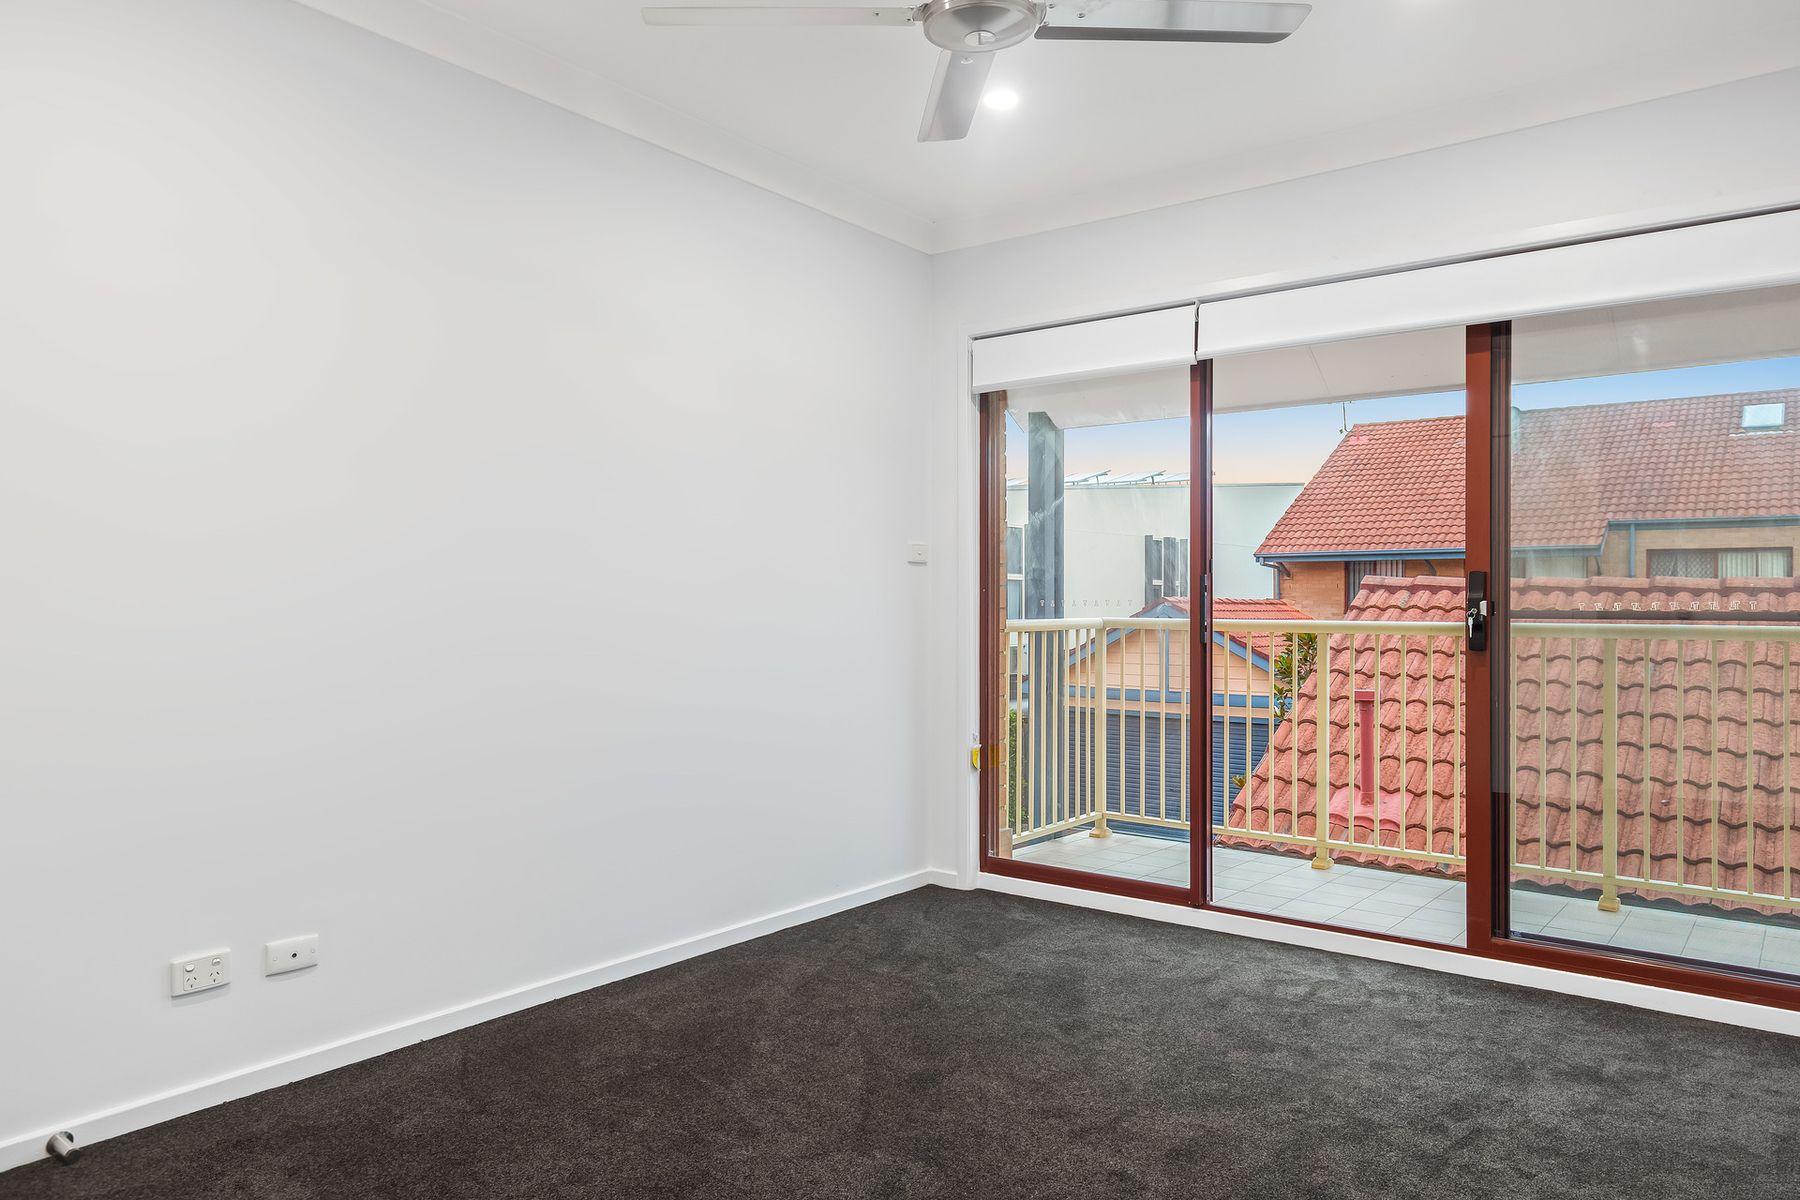 13/22 Patrick Street, Merewether, NSW 2291